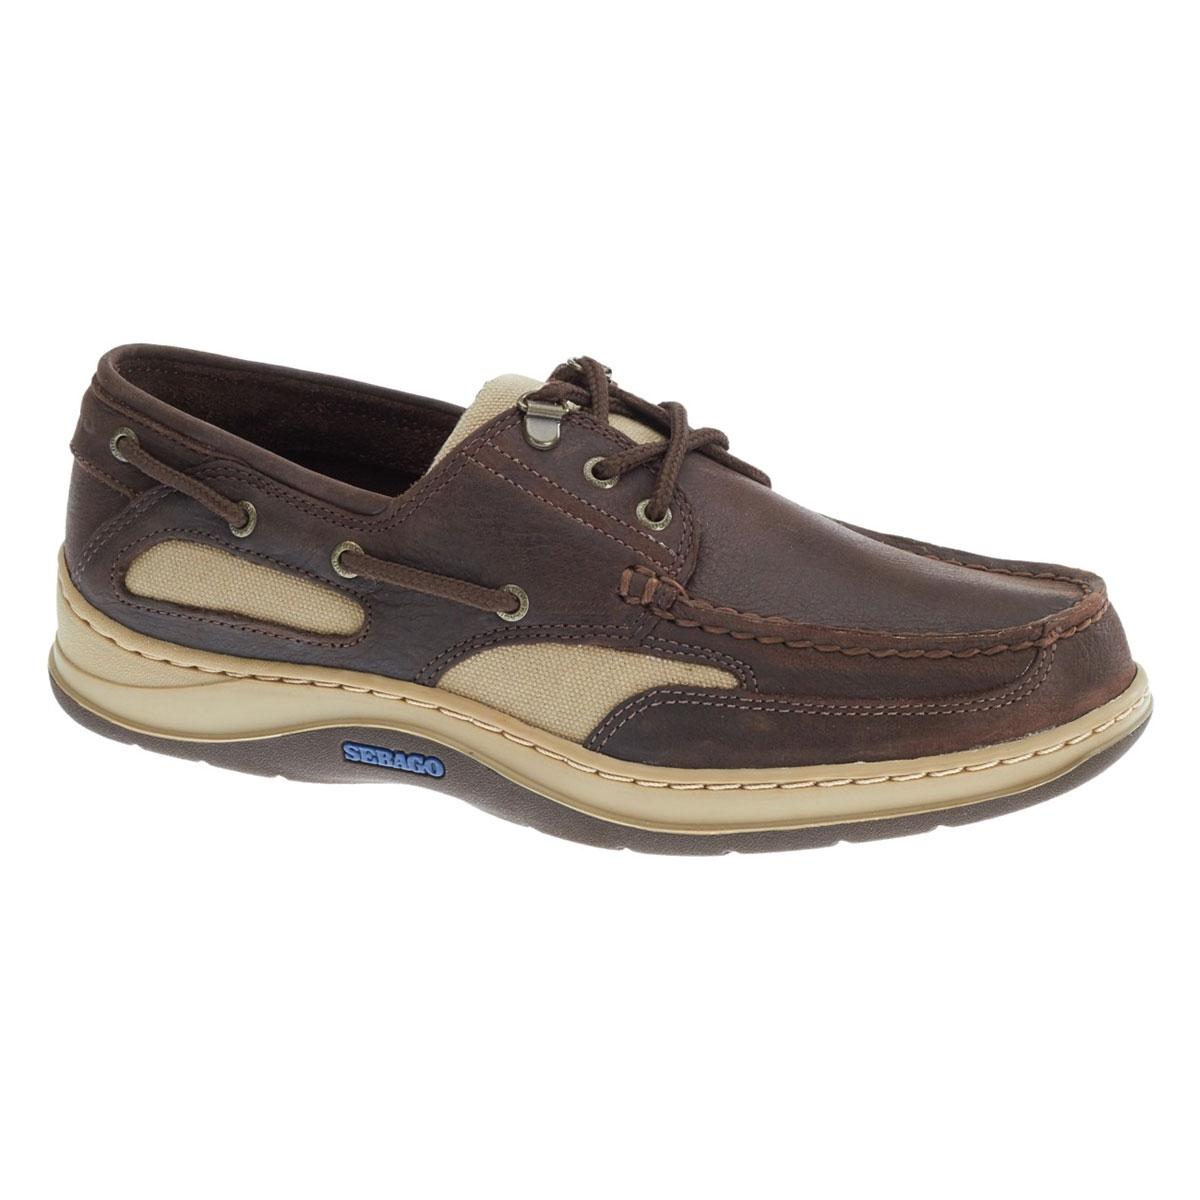 Image of Sebago Clovehitch II Shoe (Men s) - Dark Brown Leather 868bdb383c